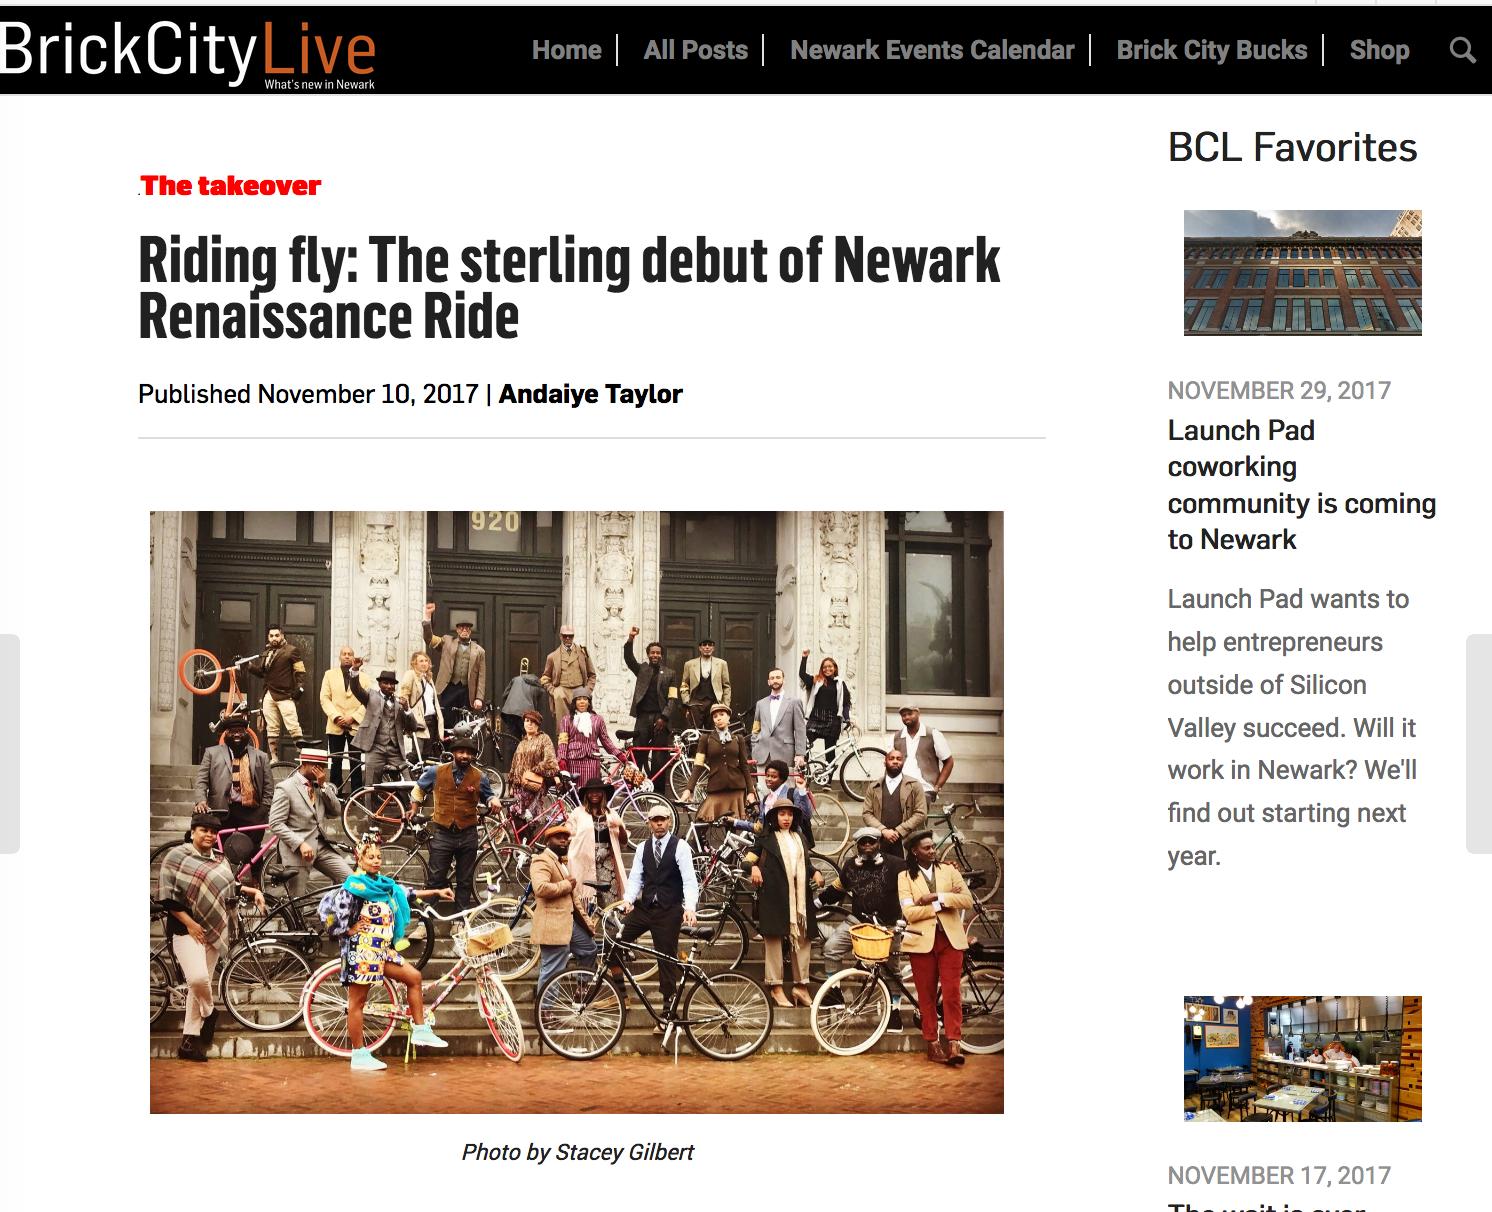 http://brickcitylive.com/news/andaiye/riding-fly-newark-renaissance-rides-sterling-debut/